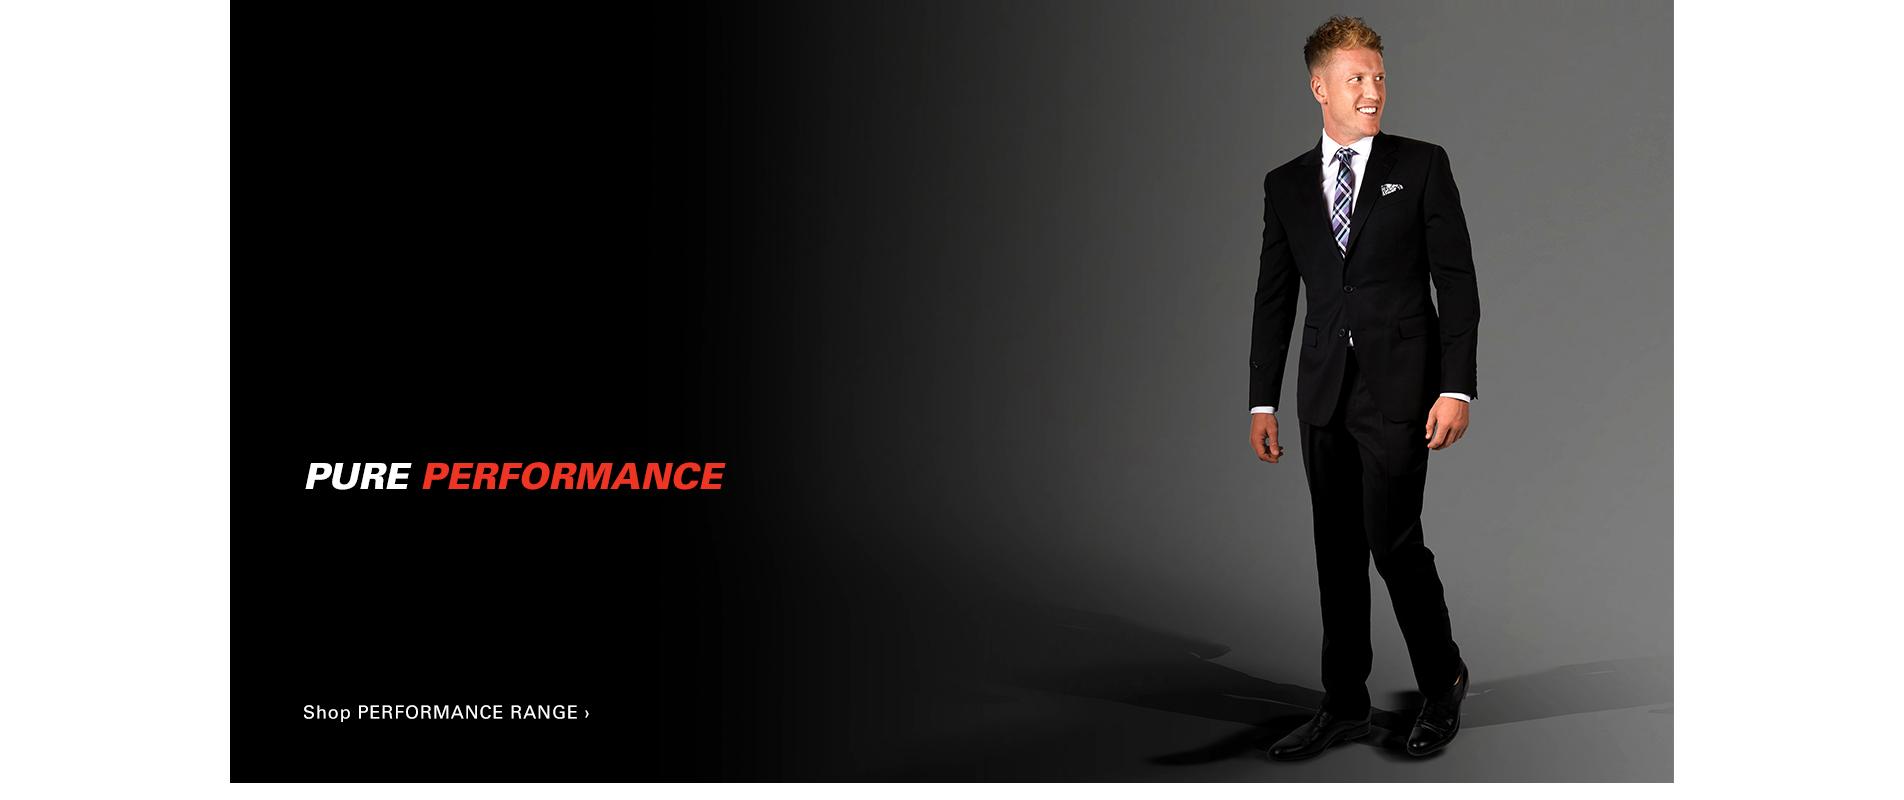 Pure Performance - Shop Performance Range >